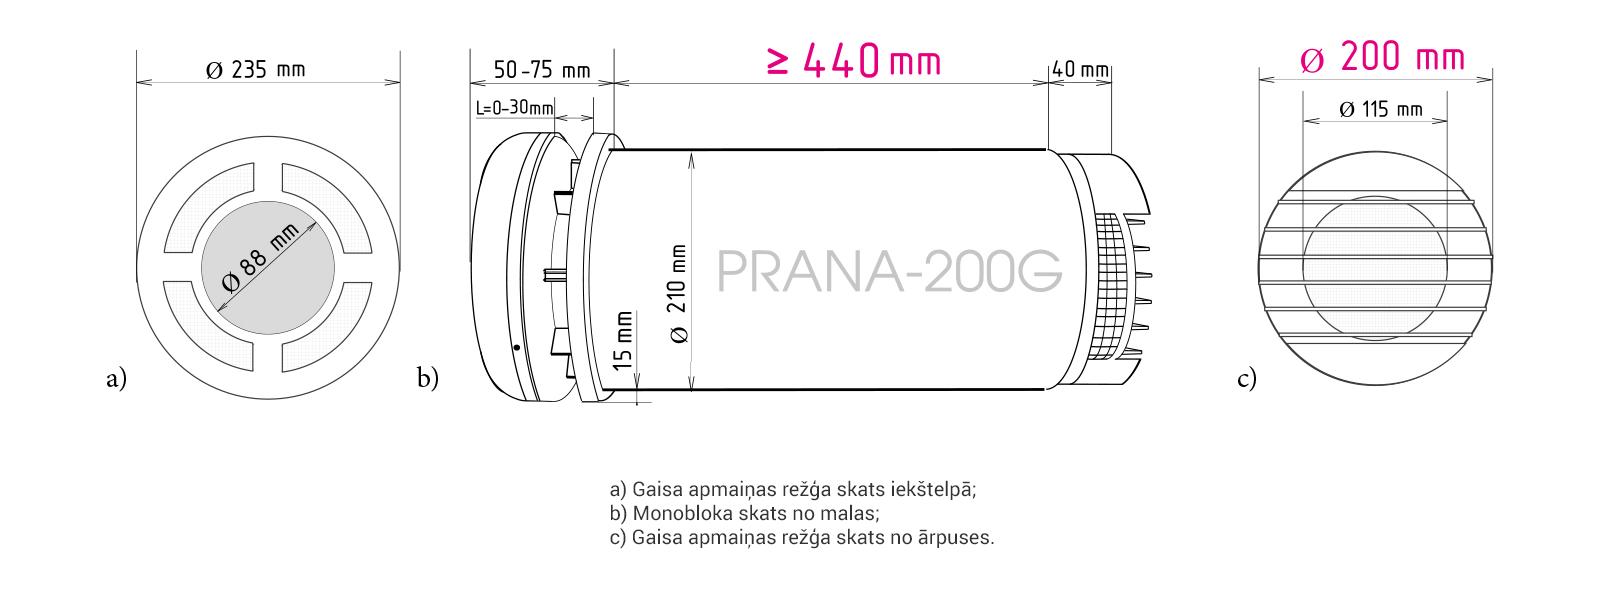 Prana-200G rekuperatora izmēri